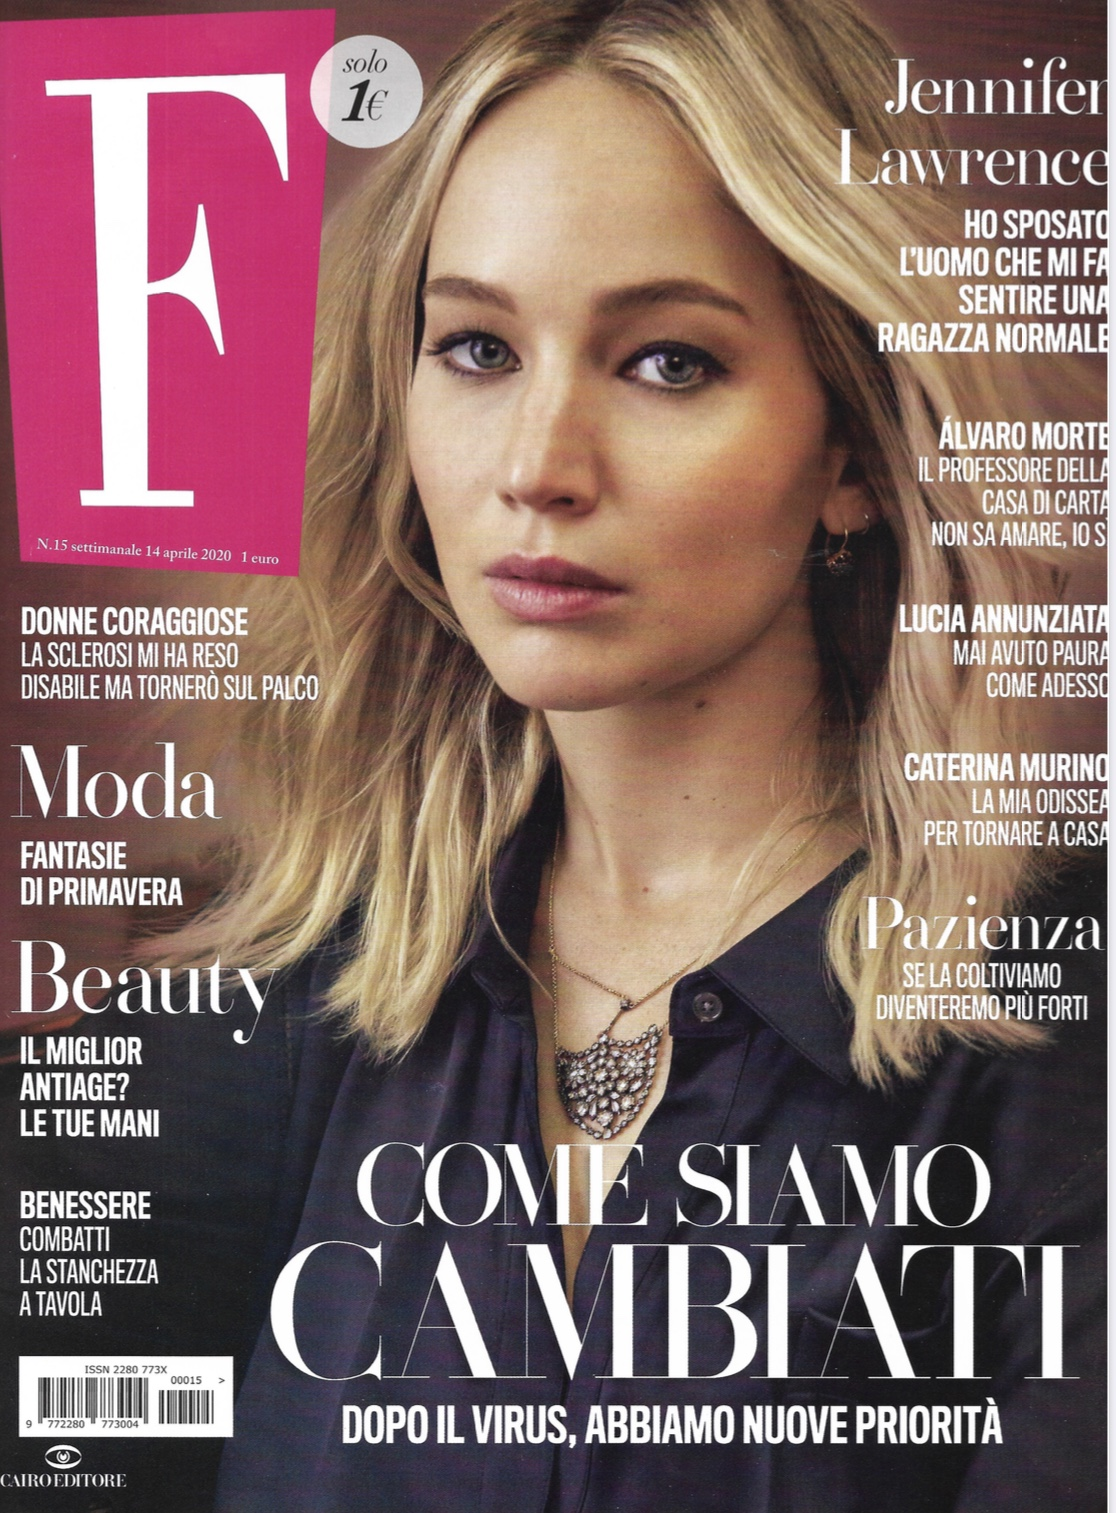 f-cover